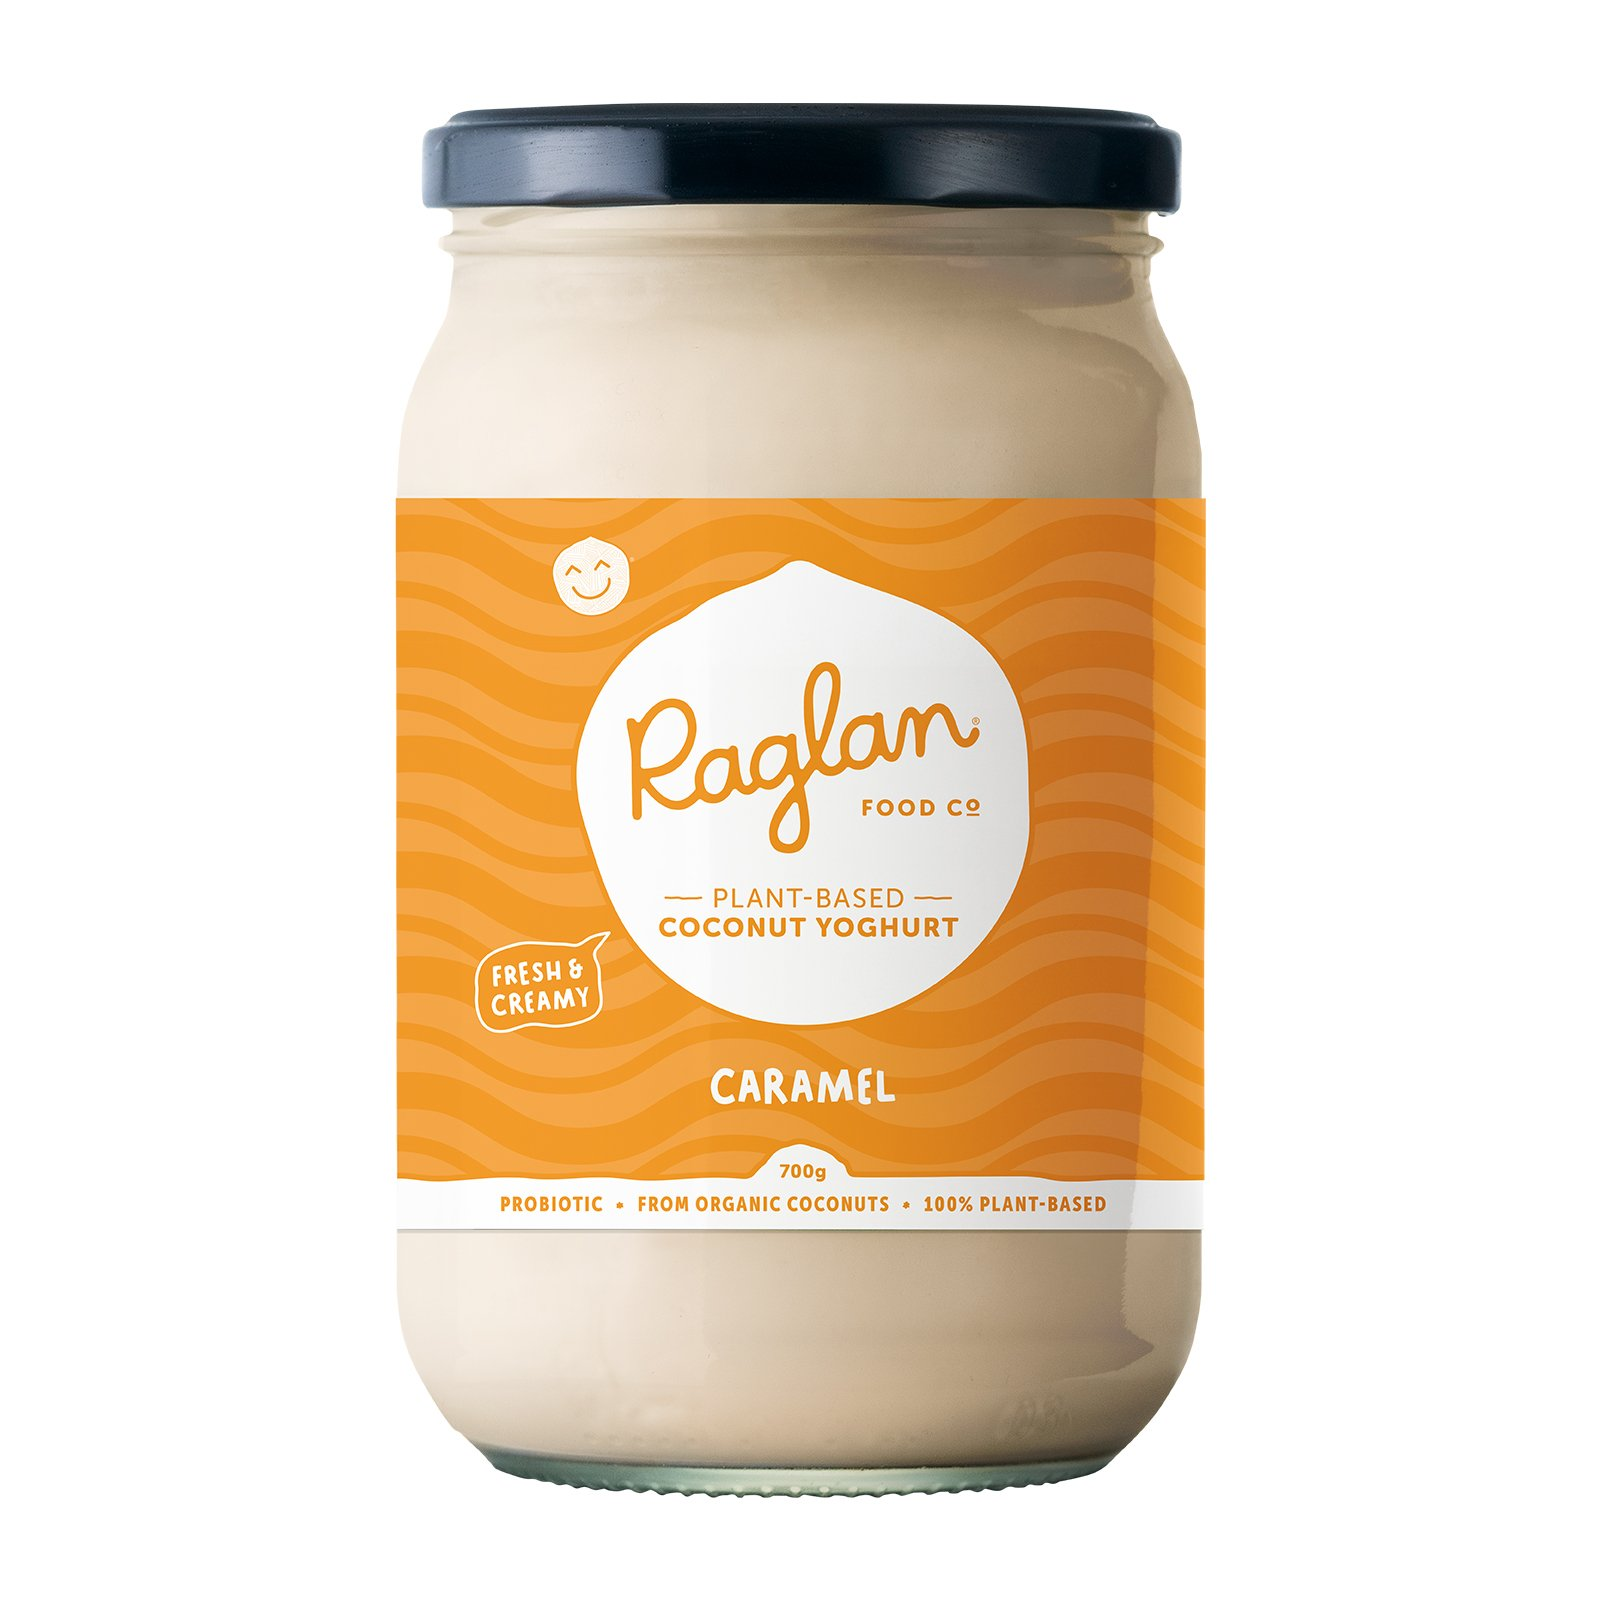 Natural Greek-style jars